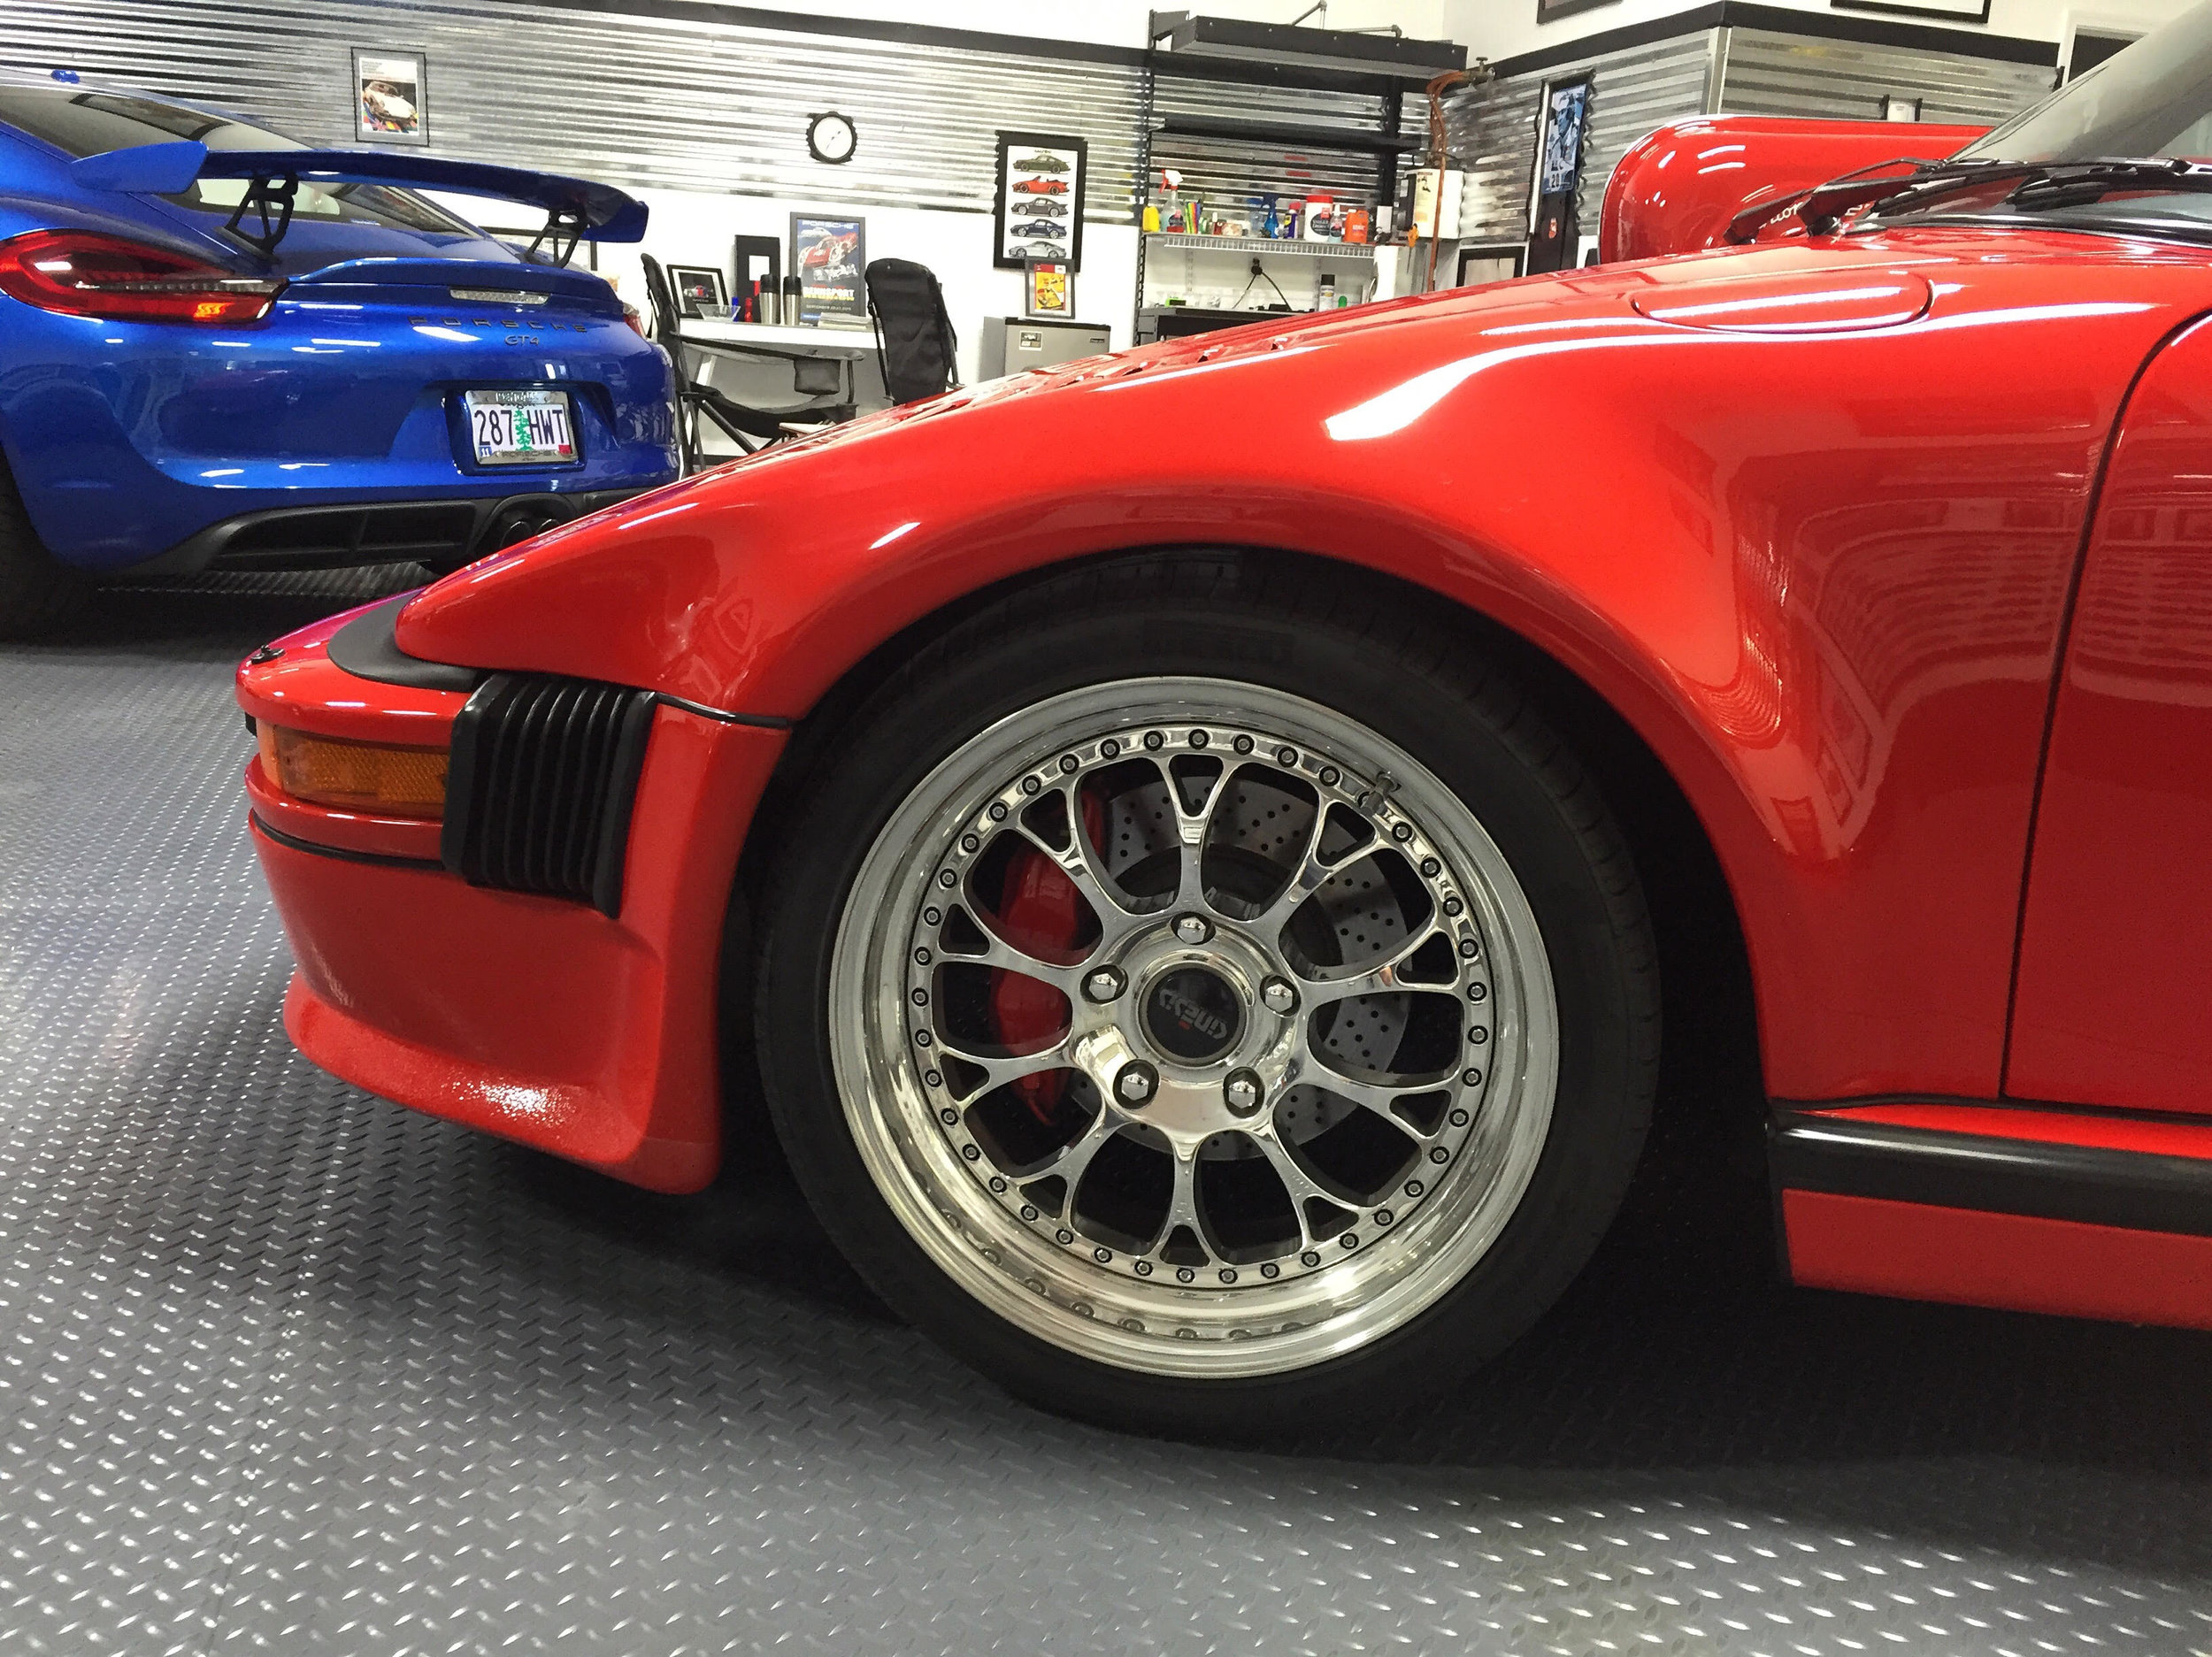 Porsche Tires.jpg